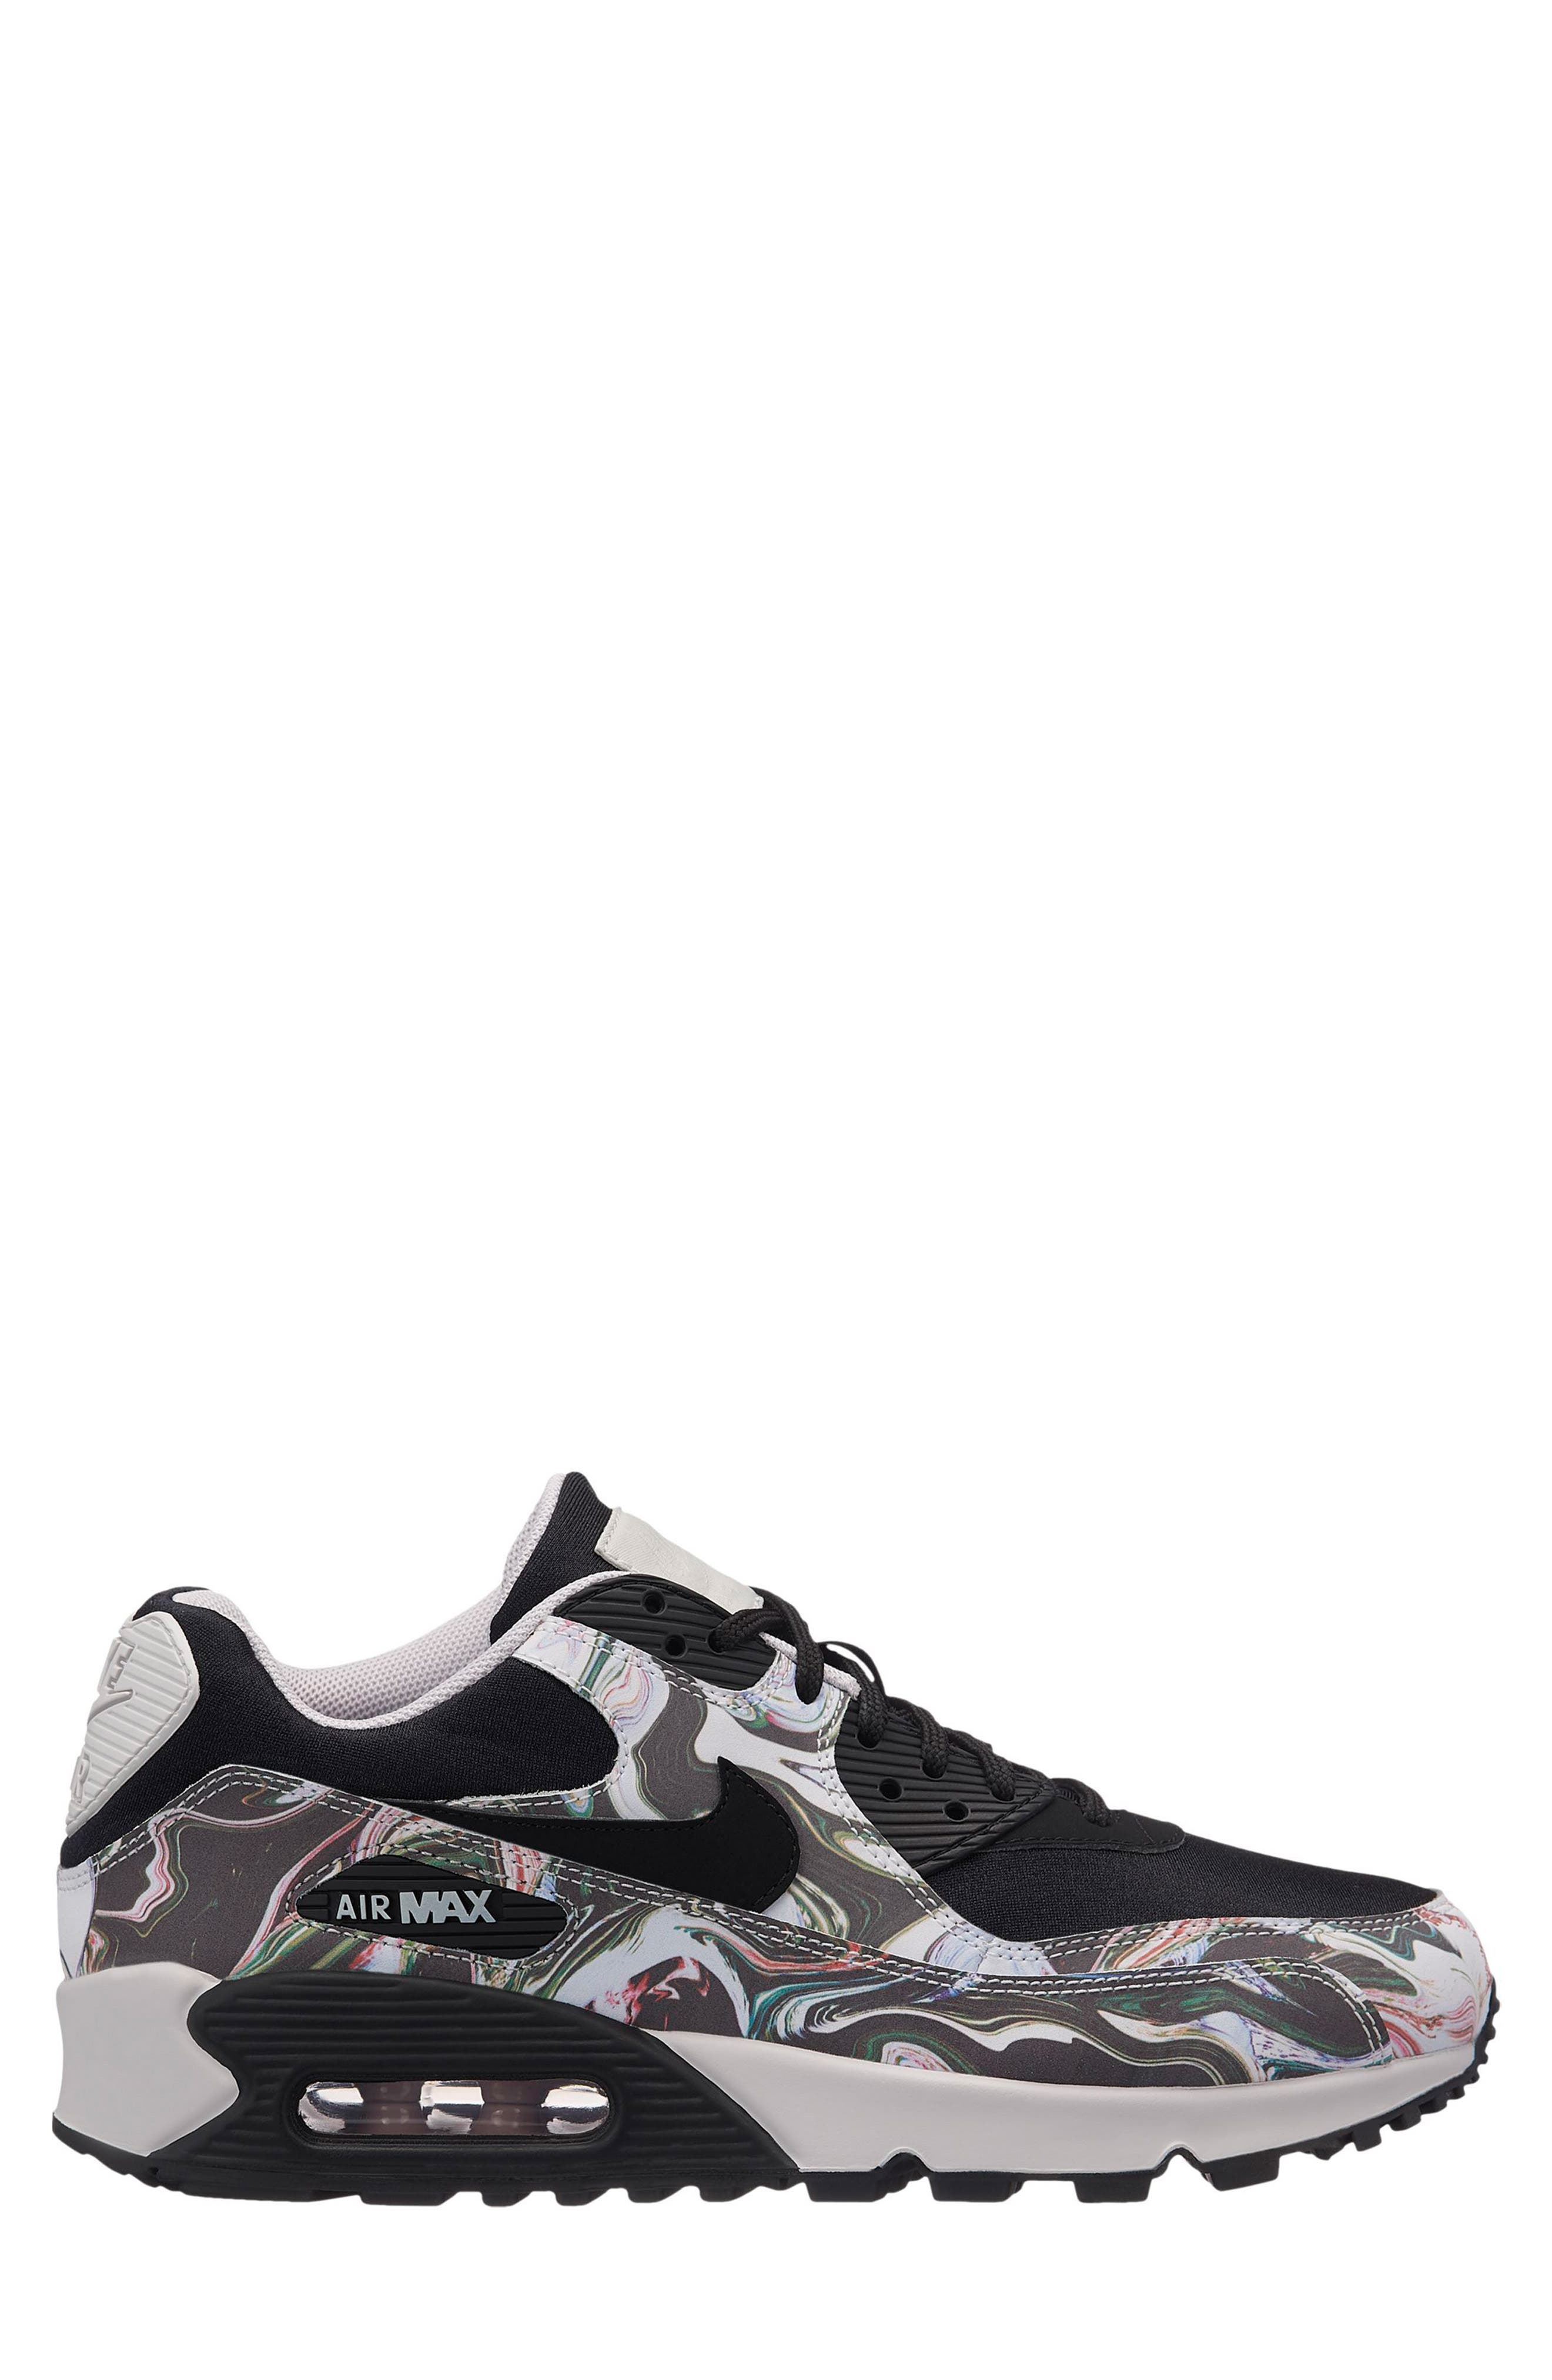 Air Max 90 Marble Sneaker,                             Main thumbnail 1, color,                             001